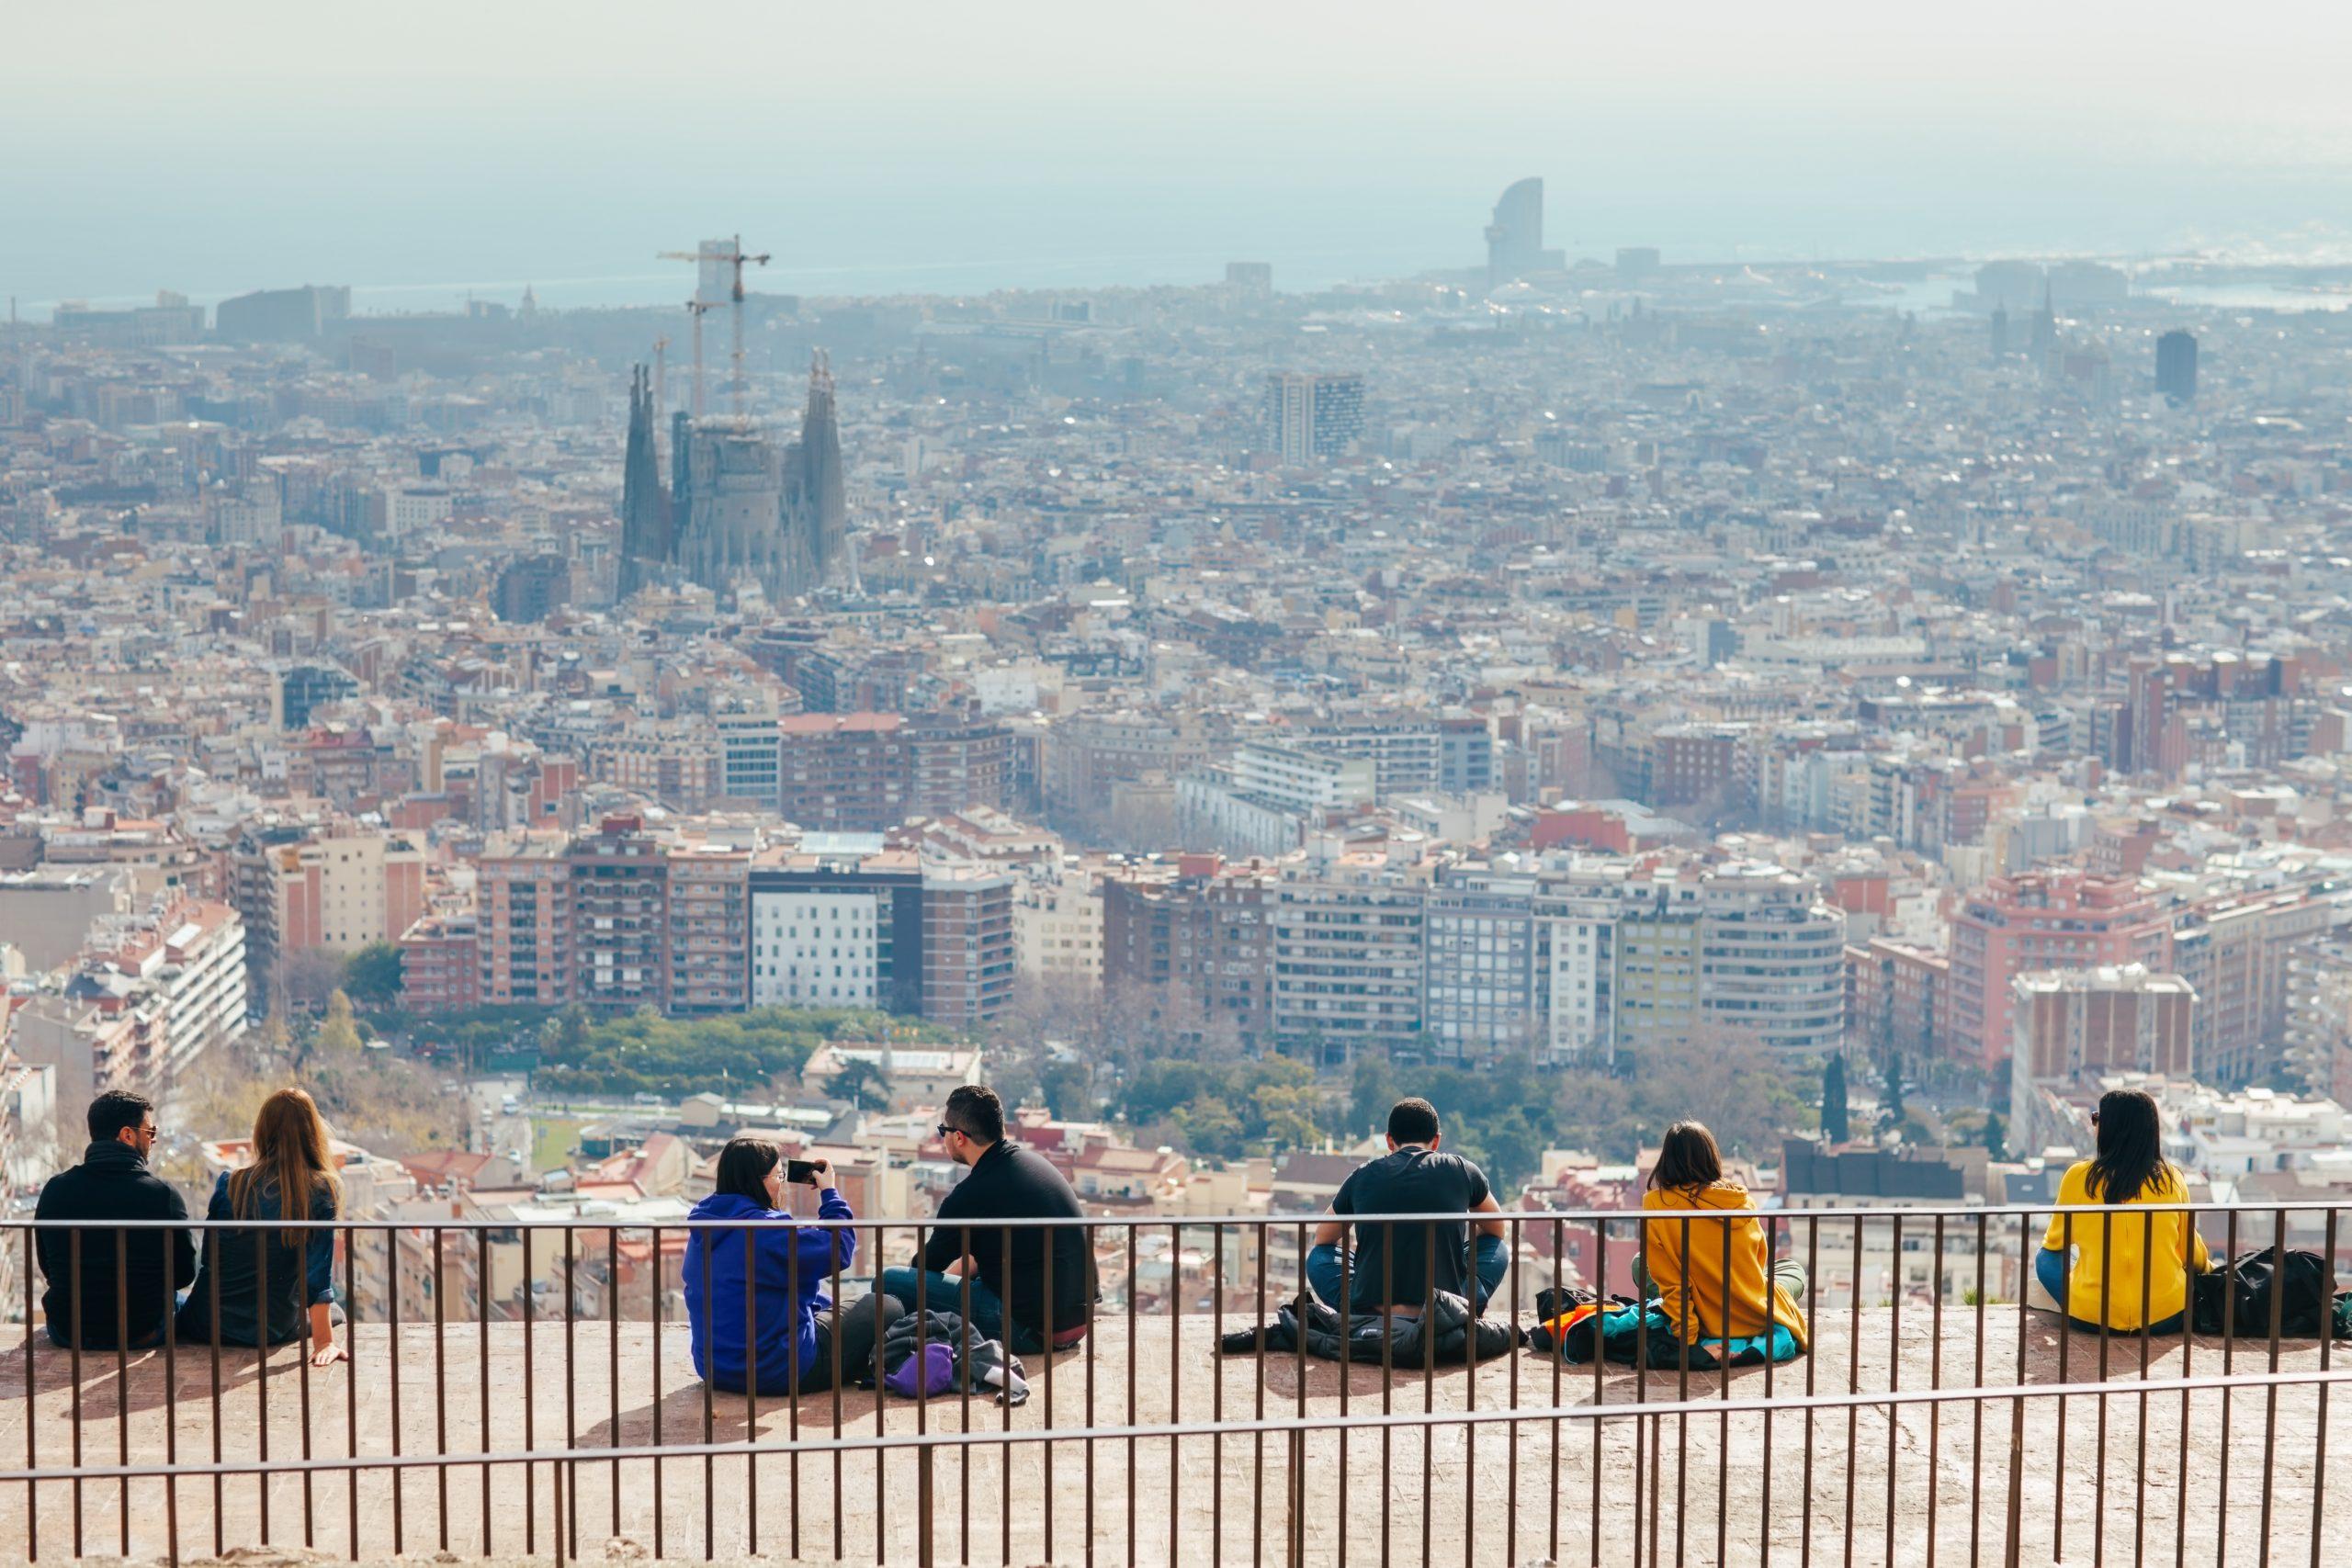 Bunkeri Karmela Barselona